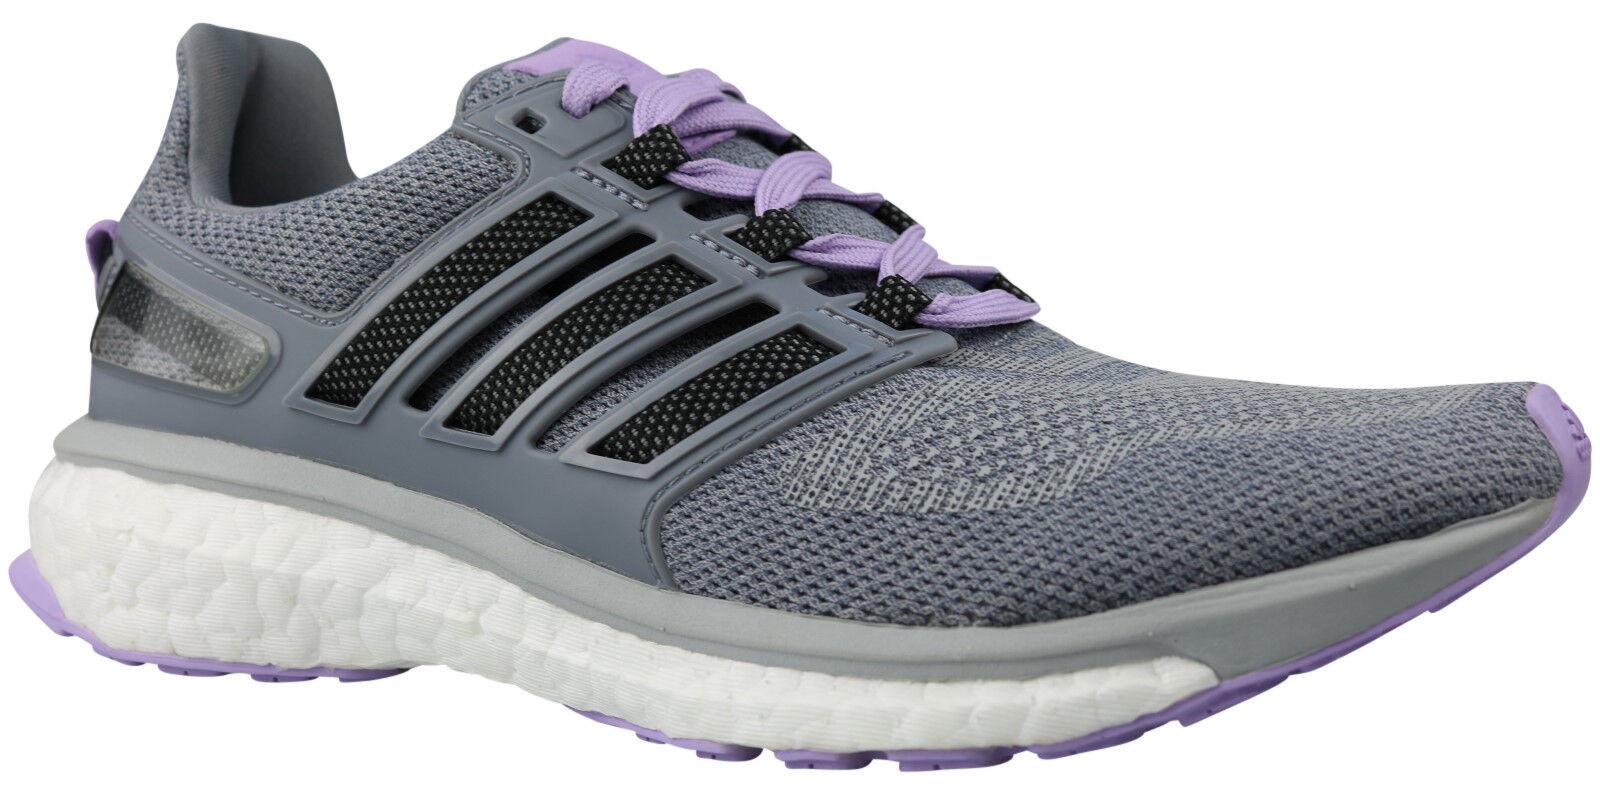 Adidas Energy Boost 3 W femmes FonctionneHommest chaussures paniers AF4937 Taille 36 - 44,5 nouveau